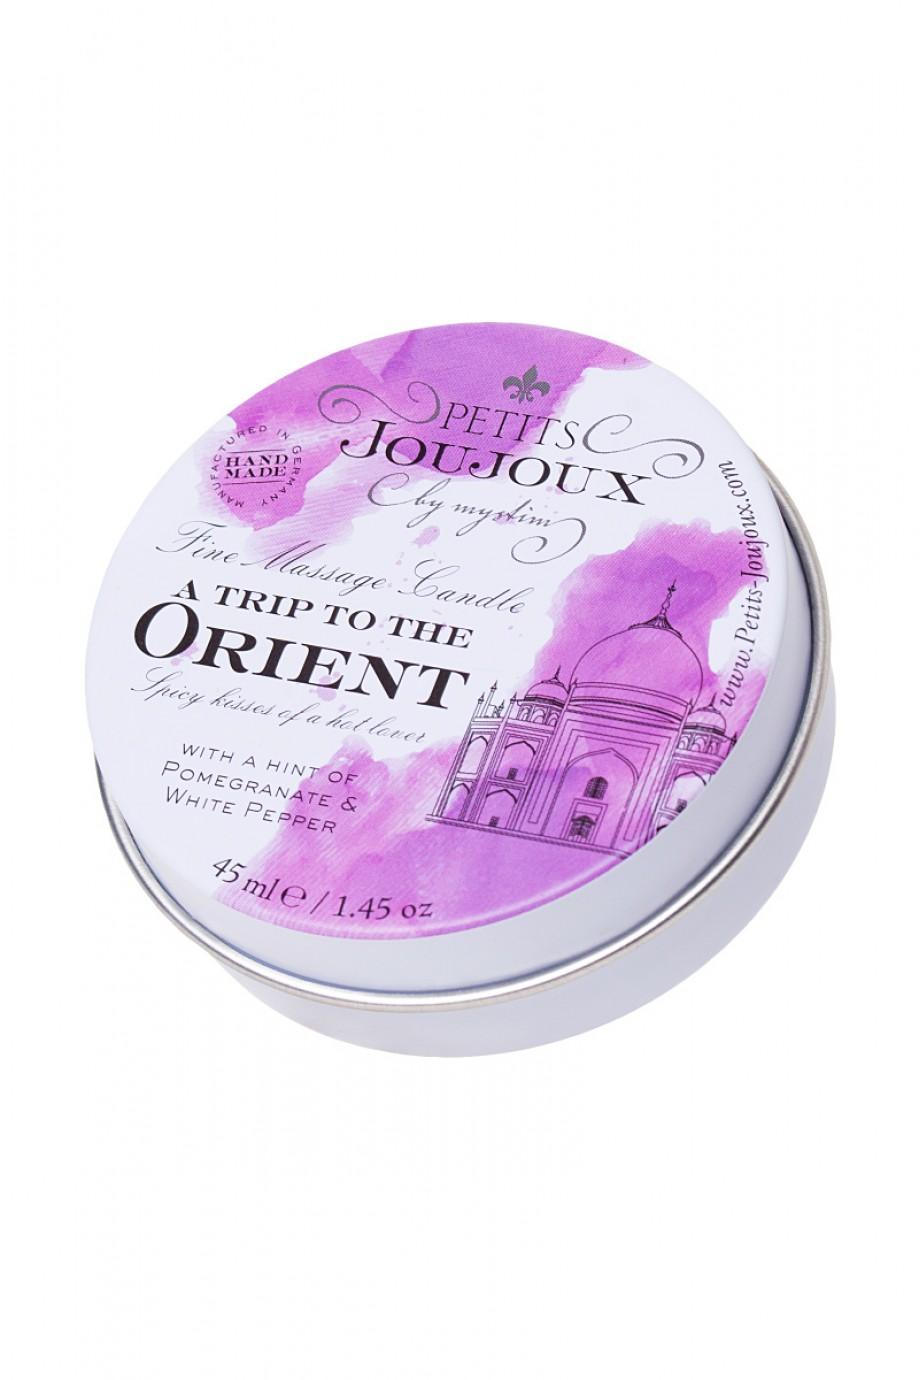 Массажная свеча Petits JouJoux Mini Orient с ароматом граната и белого перца, 43 мл